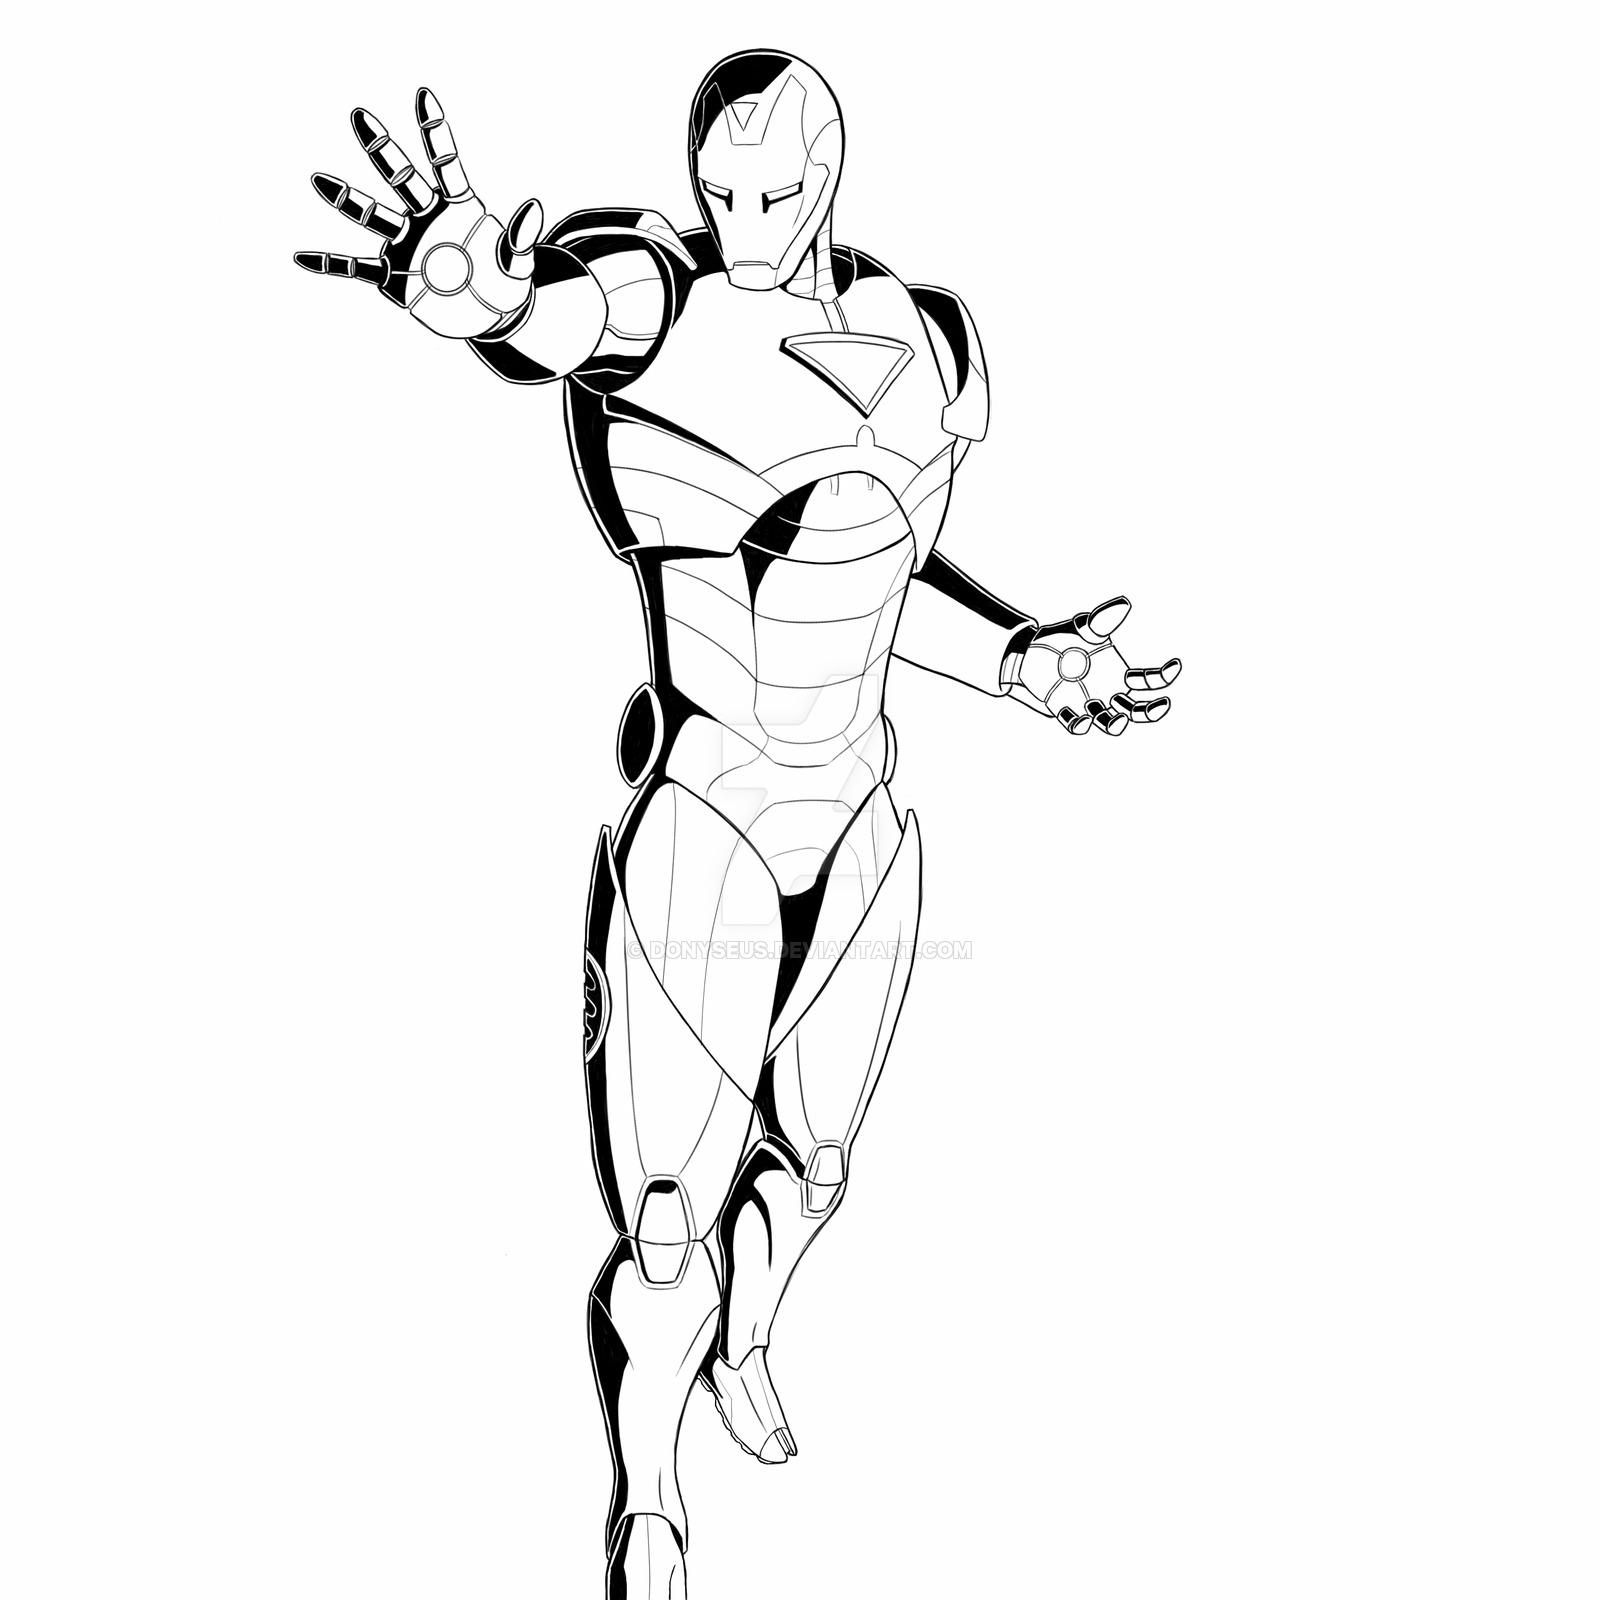 1600x1600 Iron Man Extremis Suit Inked